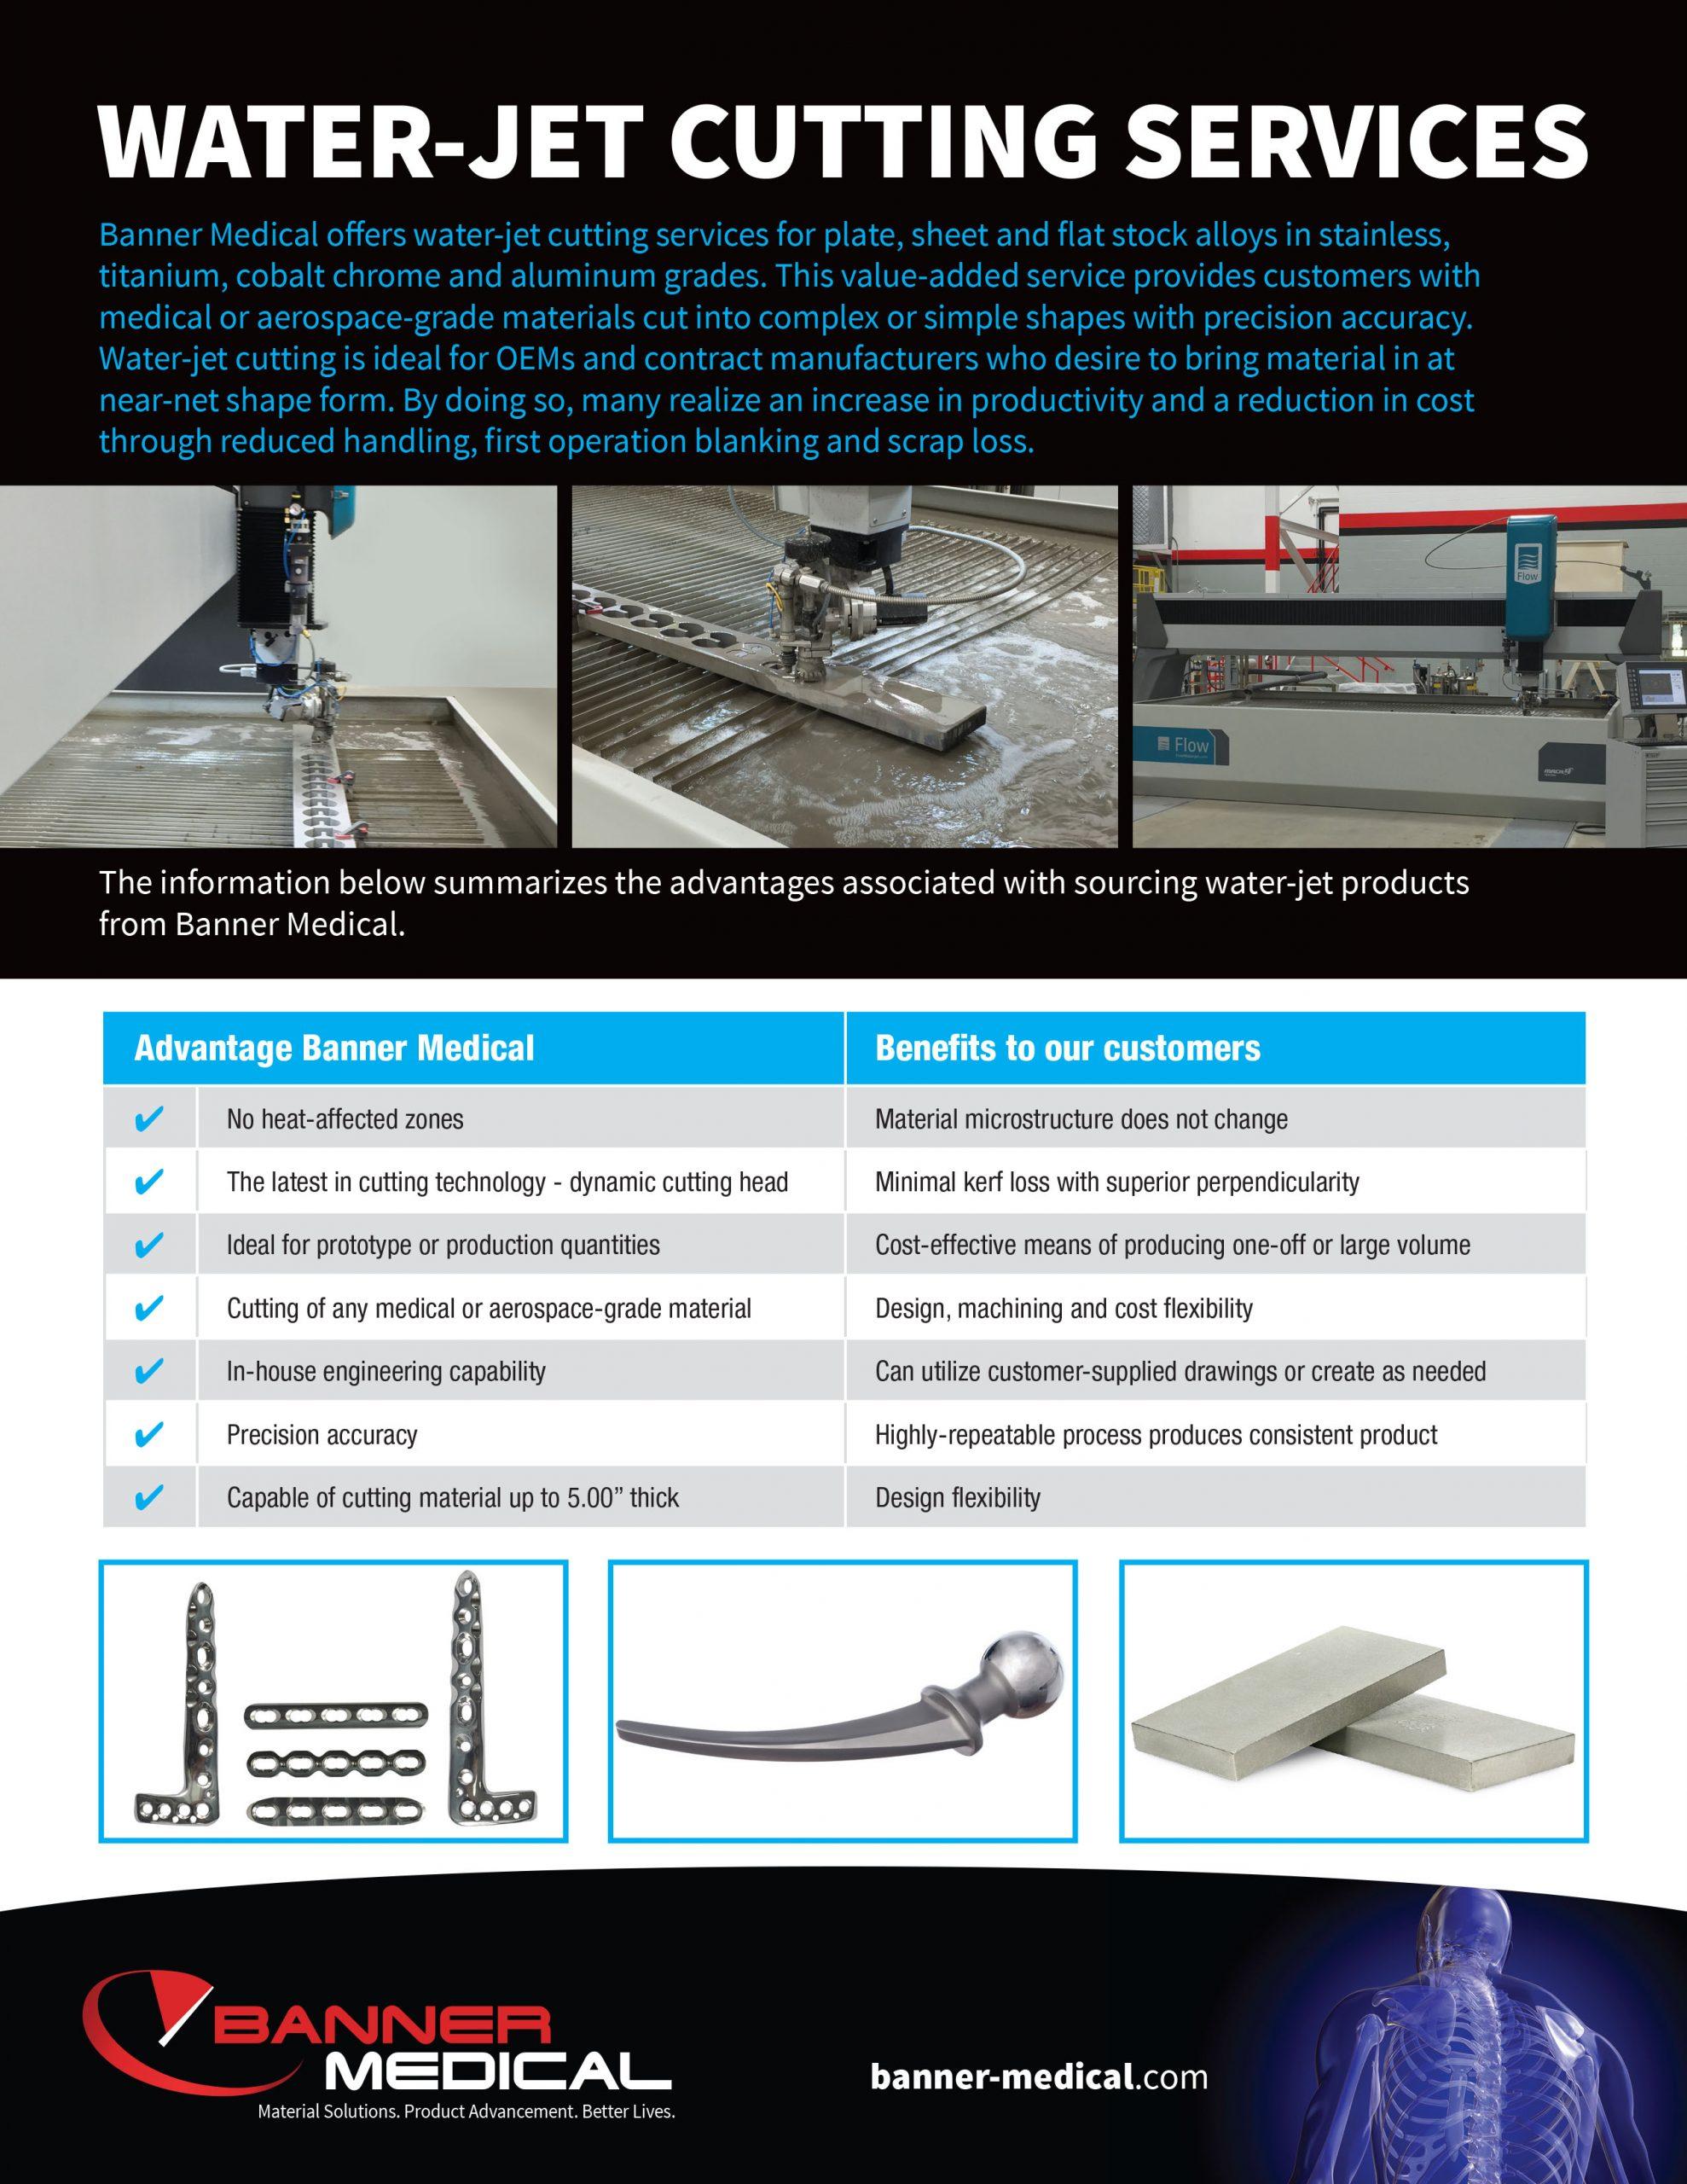 Banner Medical Water-Jet Services Brochure